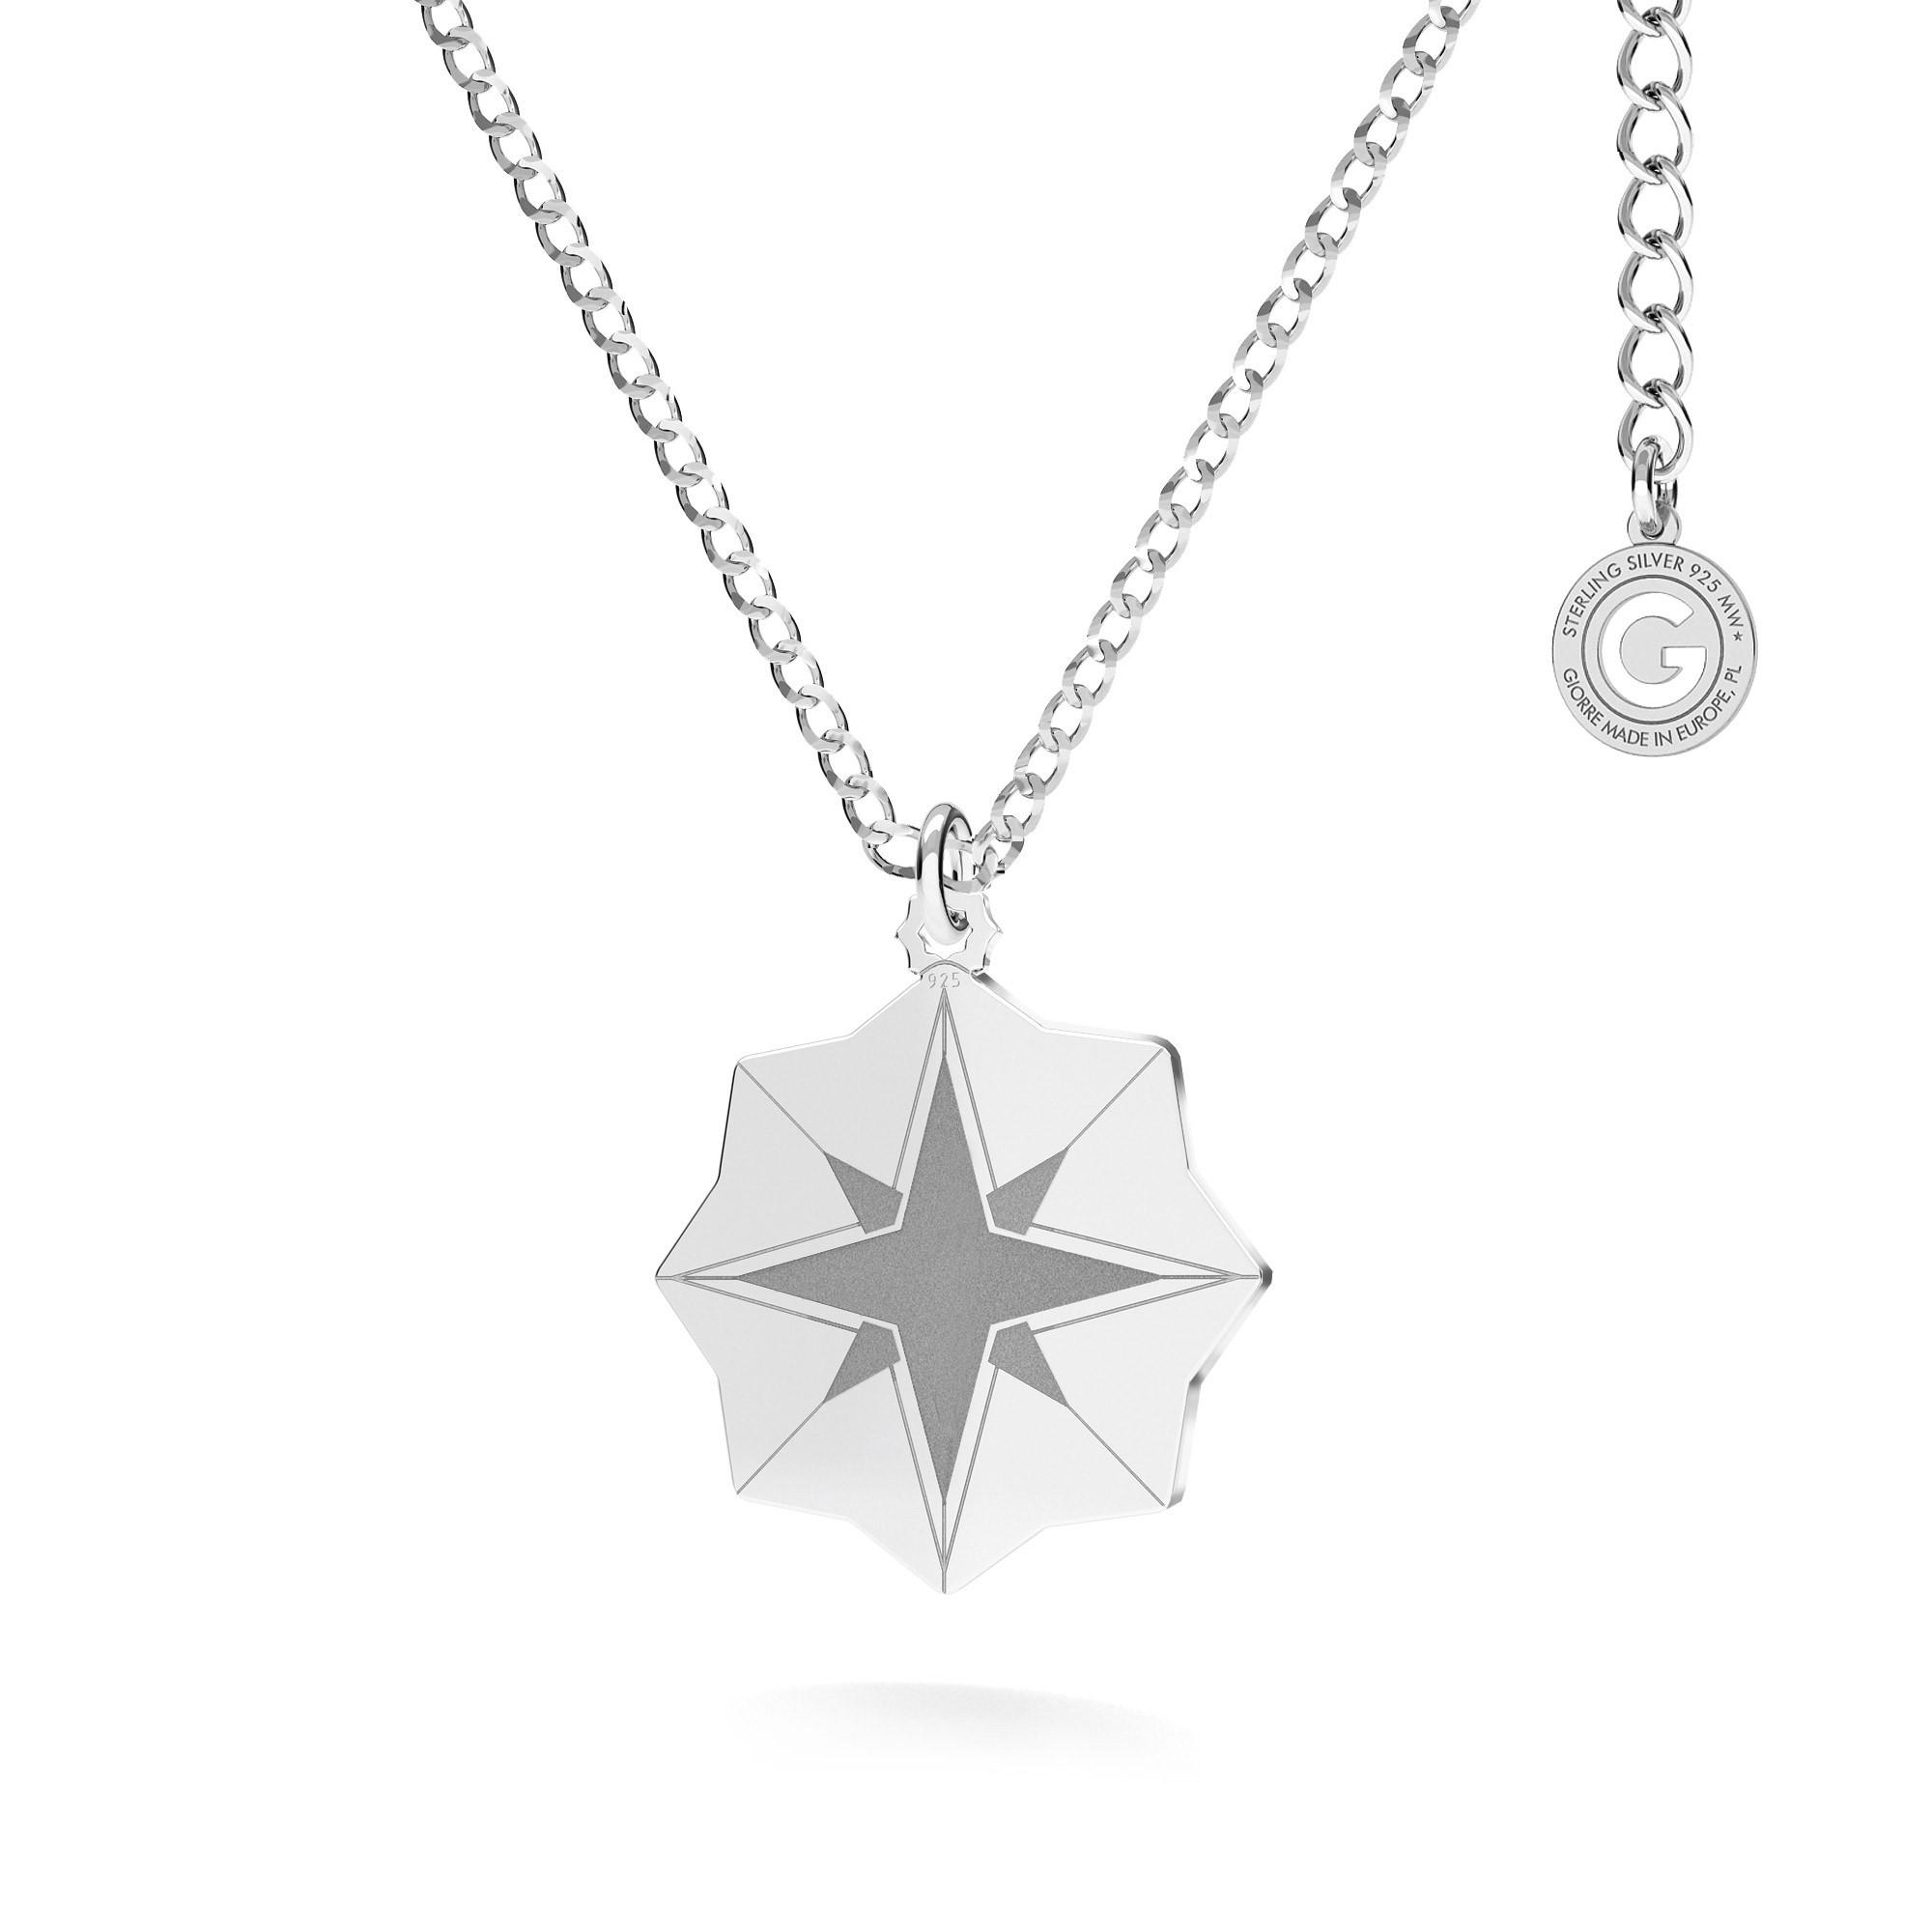 MON DÉFI Necklace - Horus eye, sterling silver 925